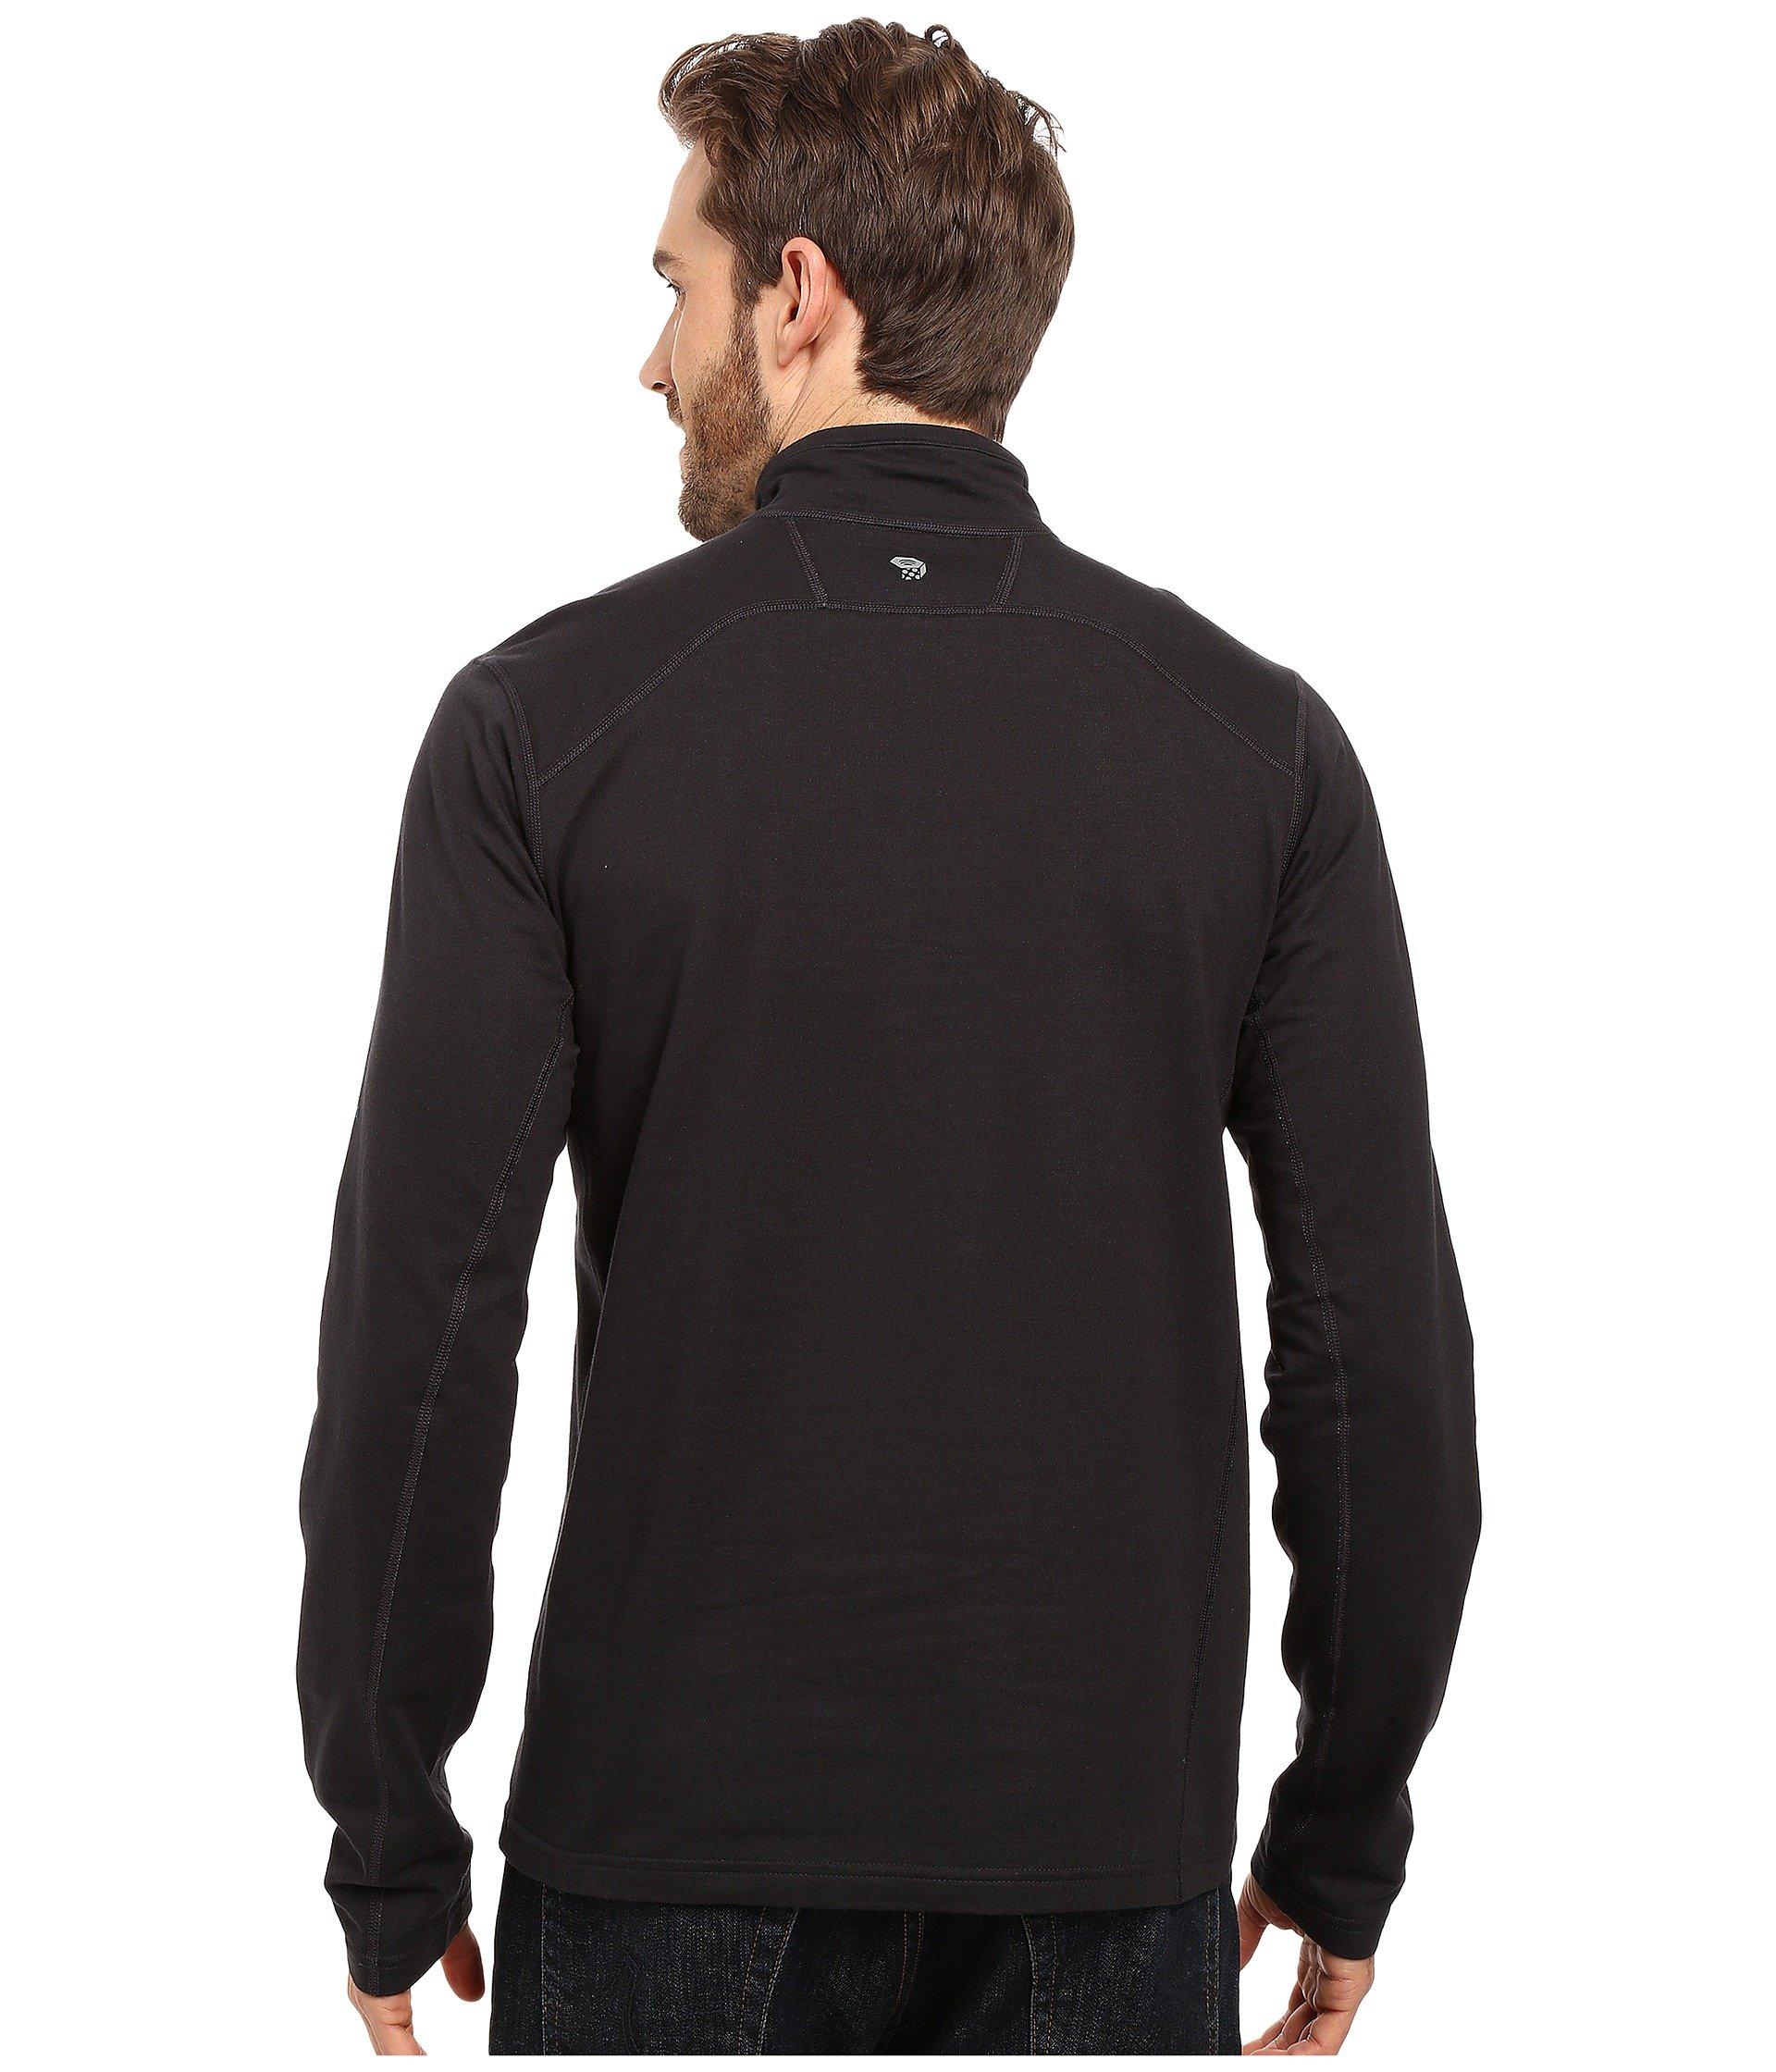 Zip Cragger™ 2 1 Mountain Black Hardwear Top w0zqO8